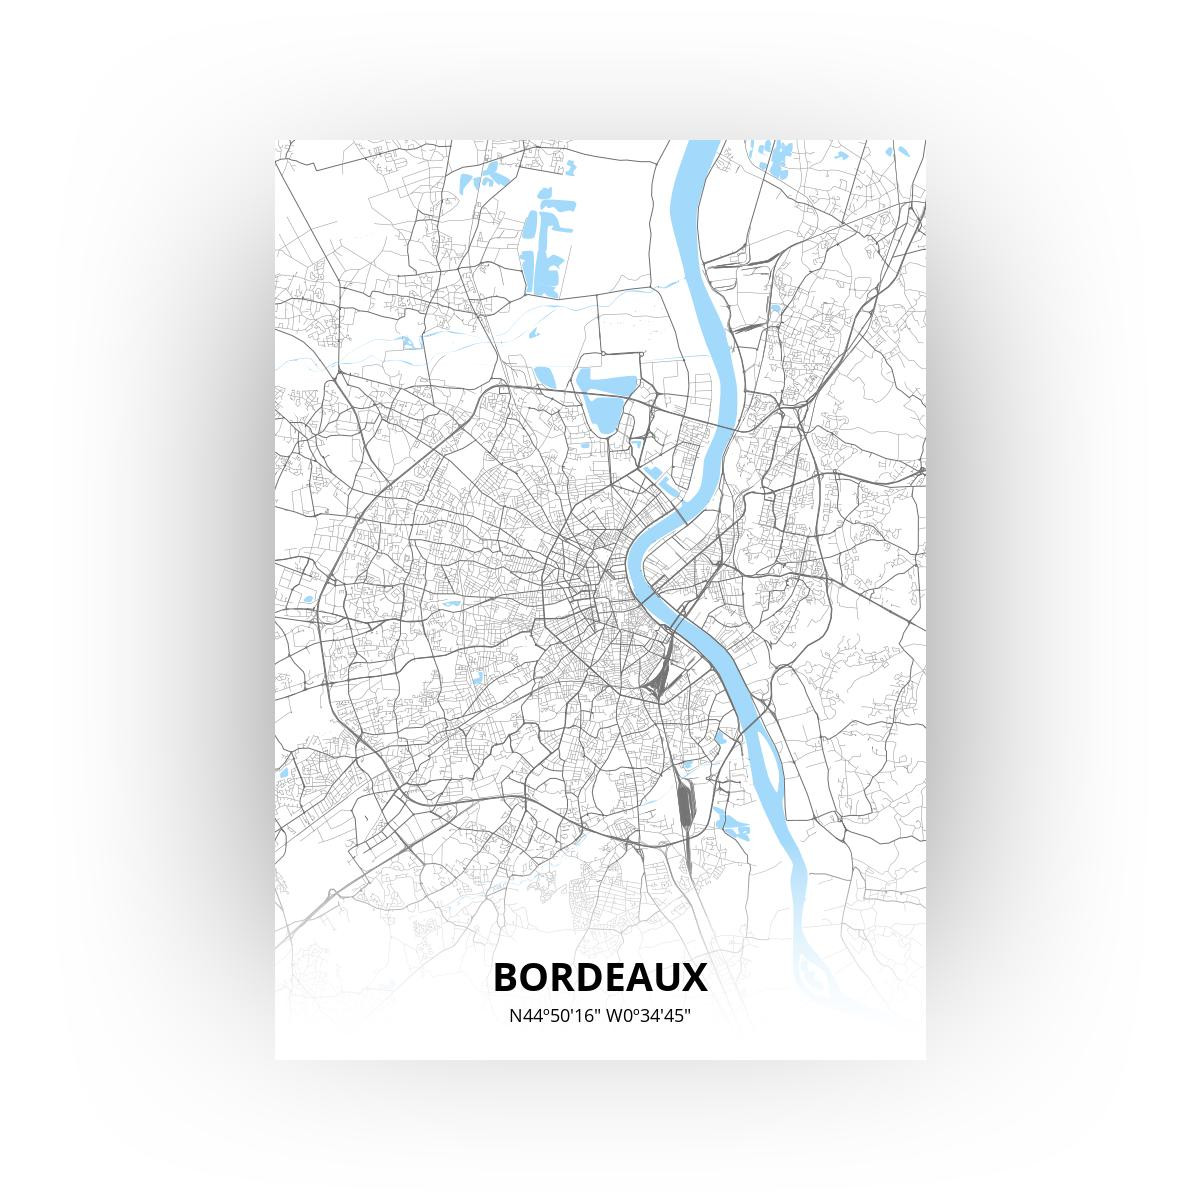 Bordeaux print - Standaard stijl